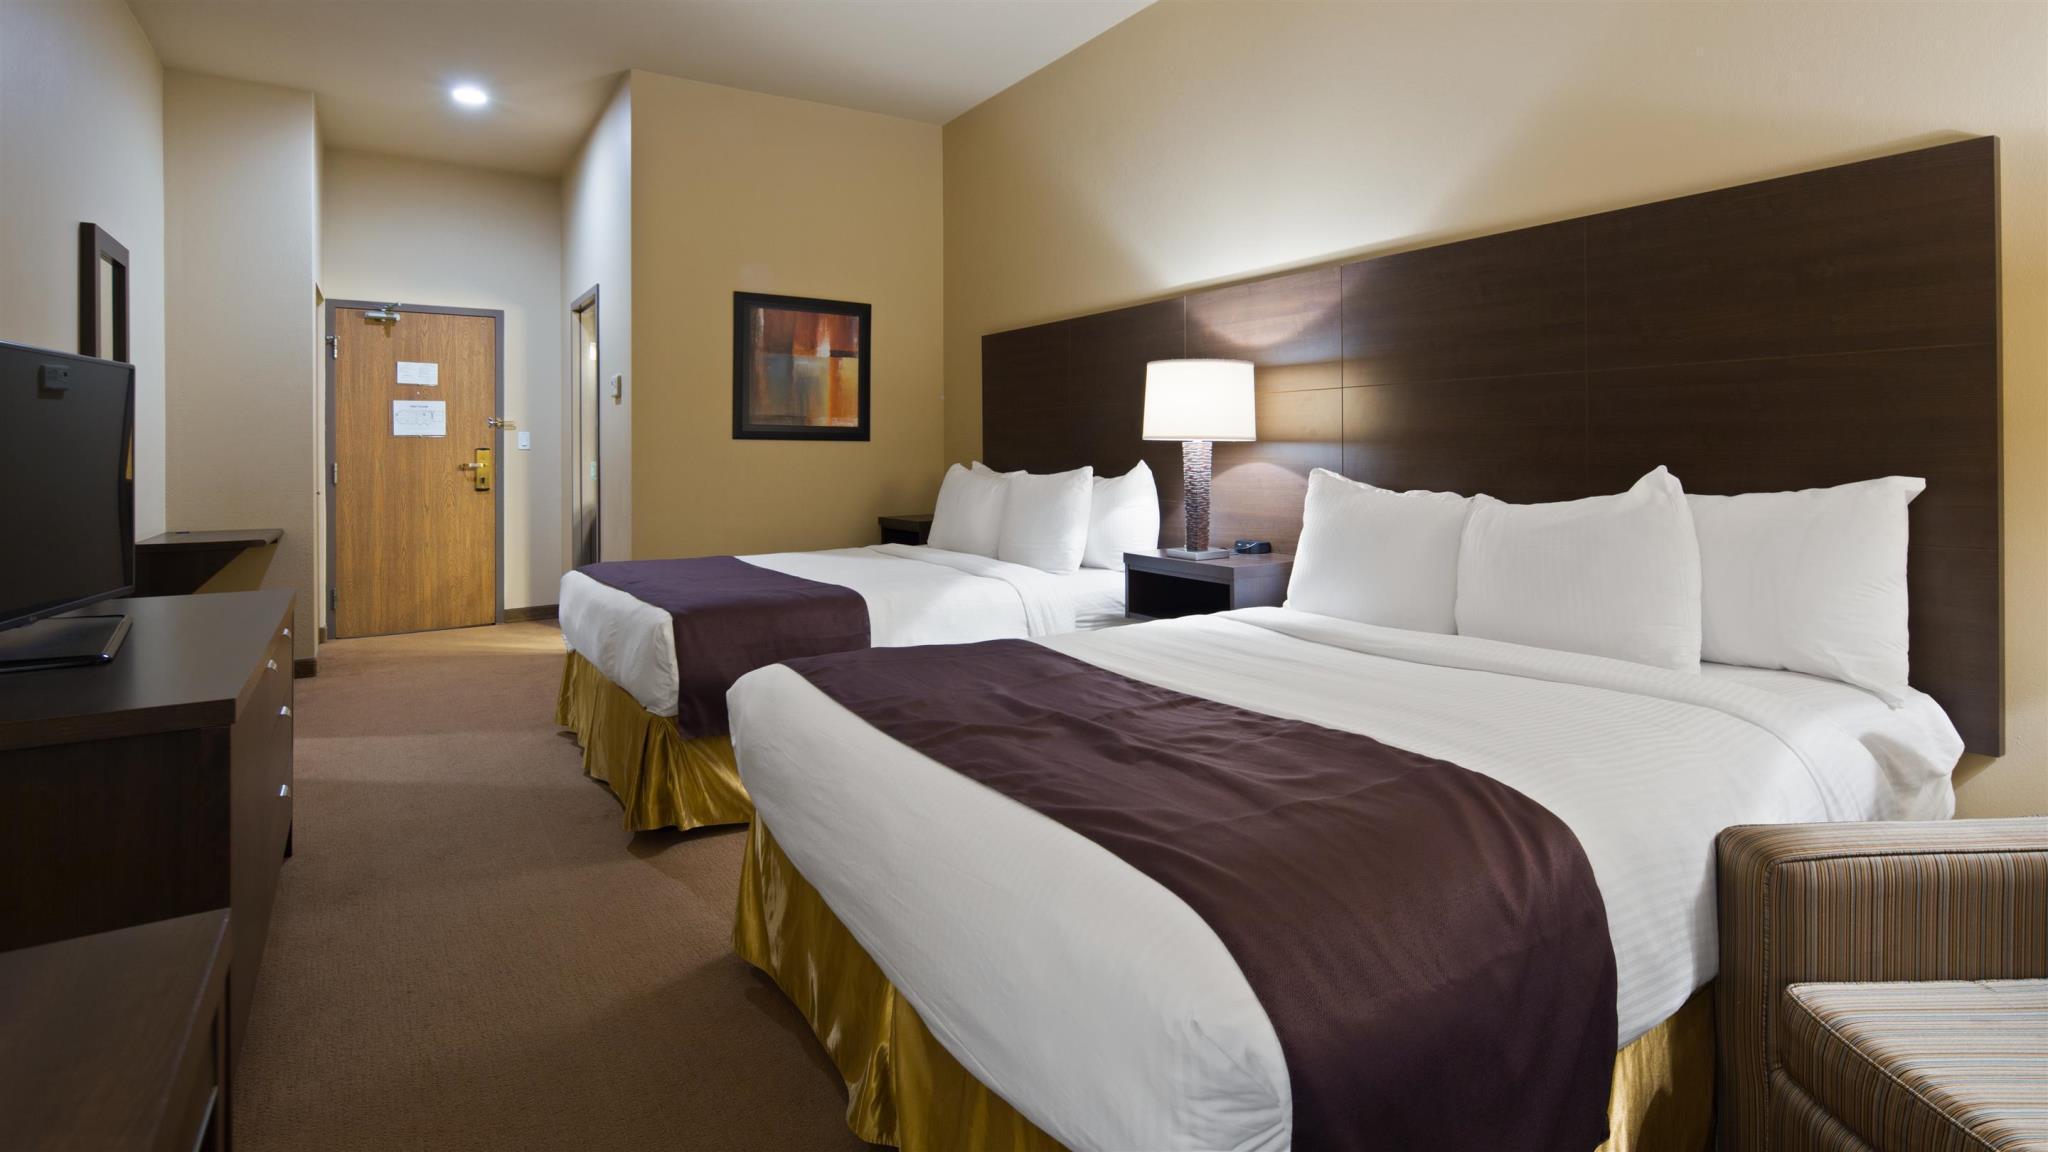 Best Western Plus Saint John Hotel and Suites, Saint John